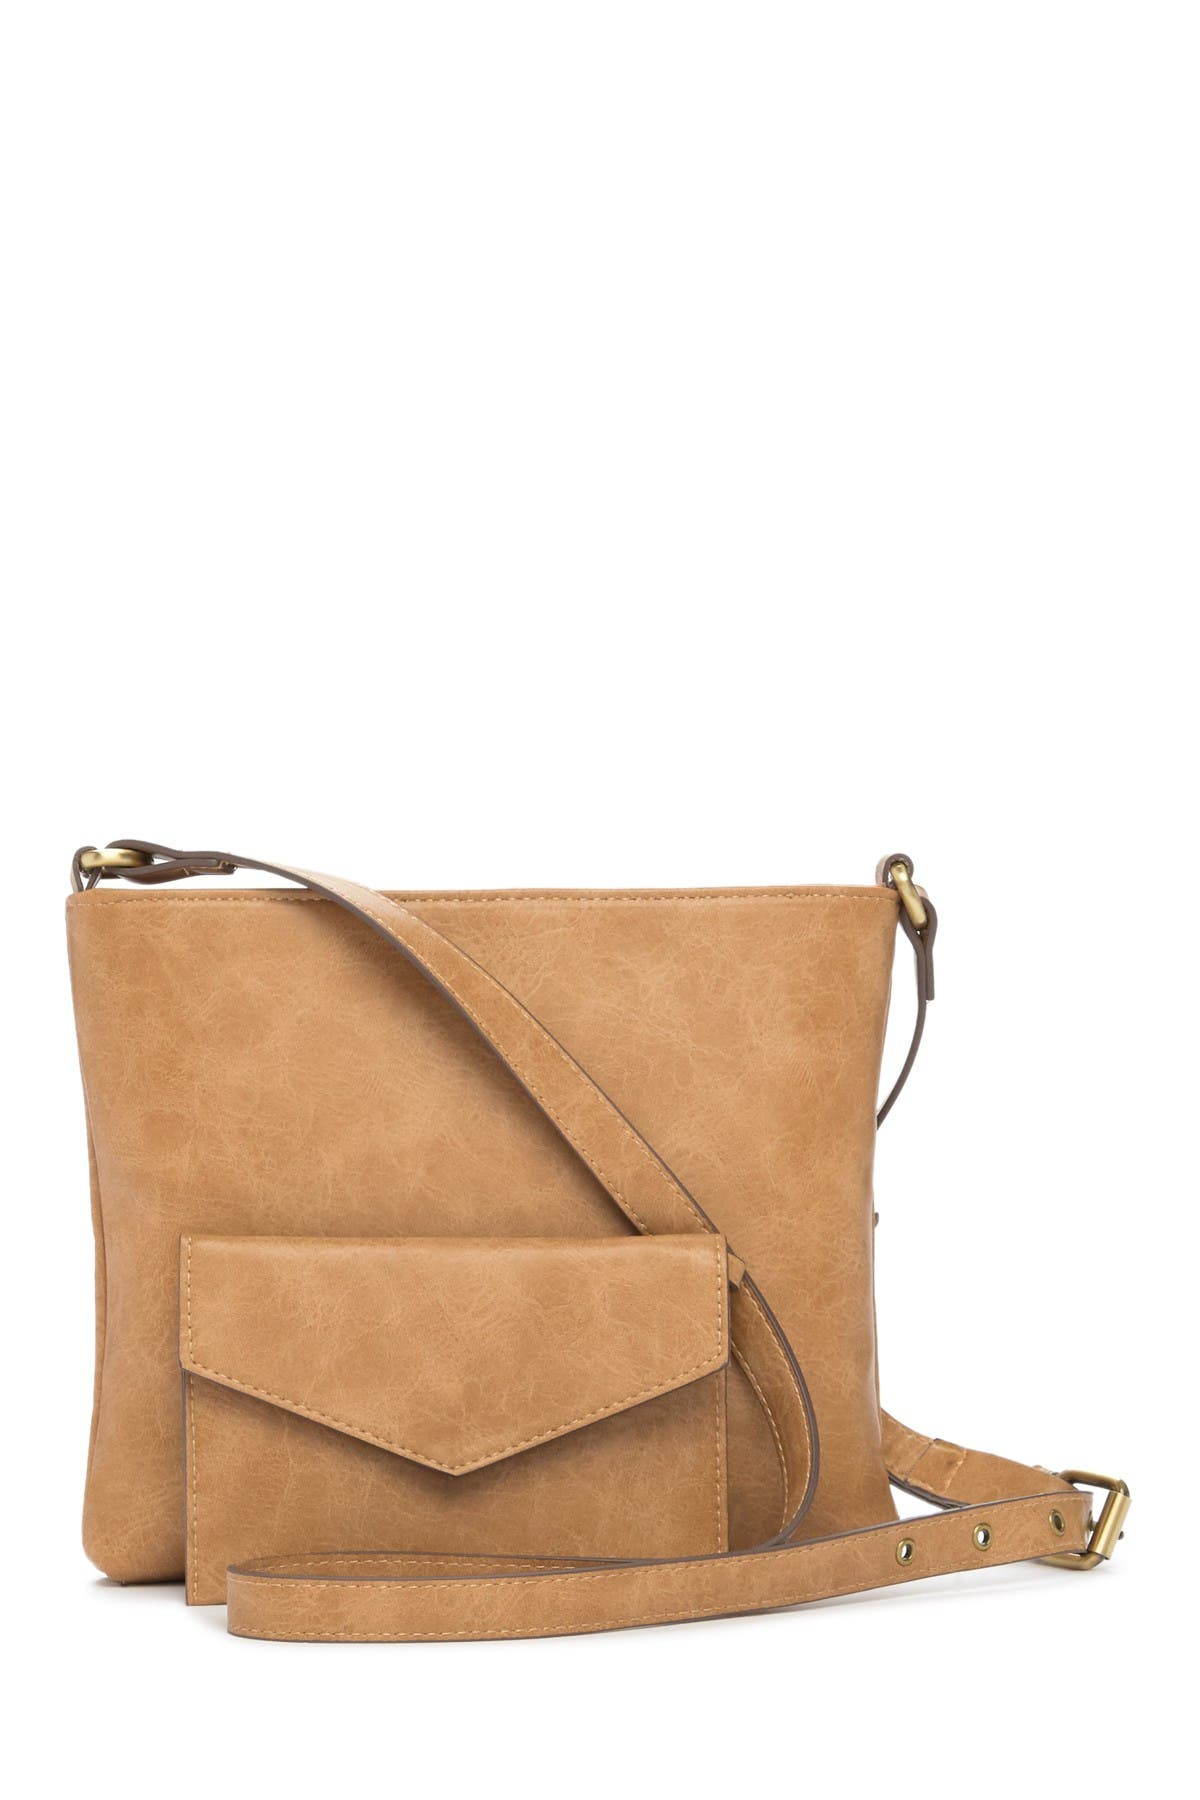 Image of ELLE & JAE GYPSET Waimea Bay Crossbody Bag